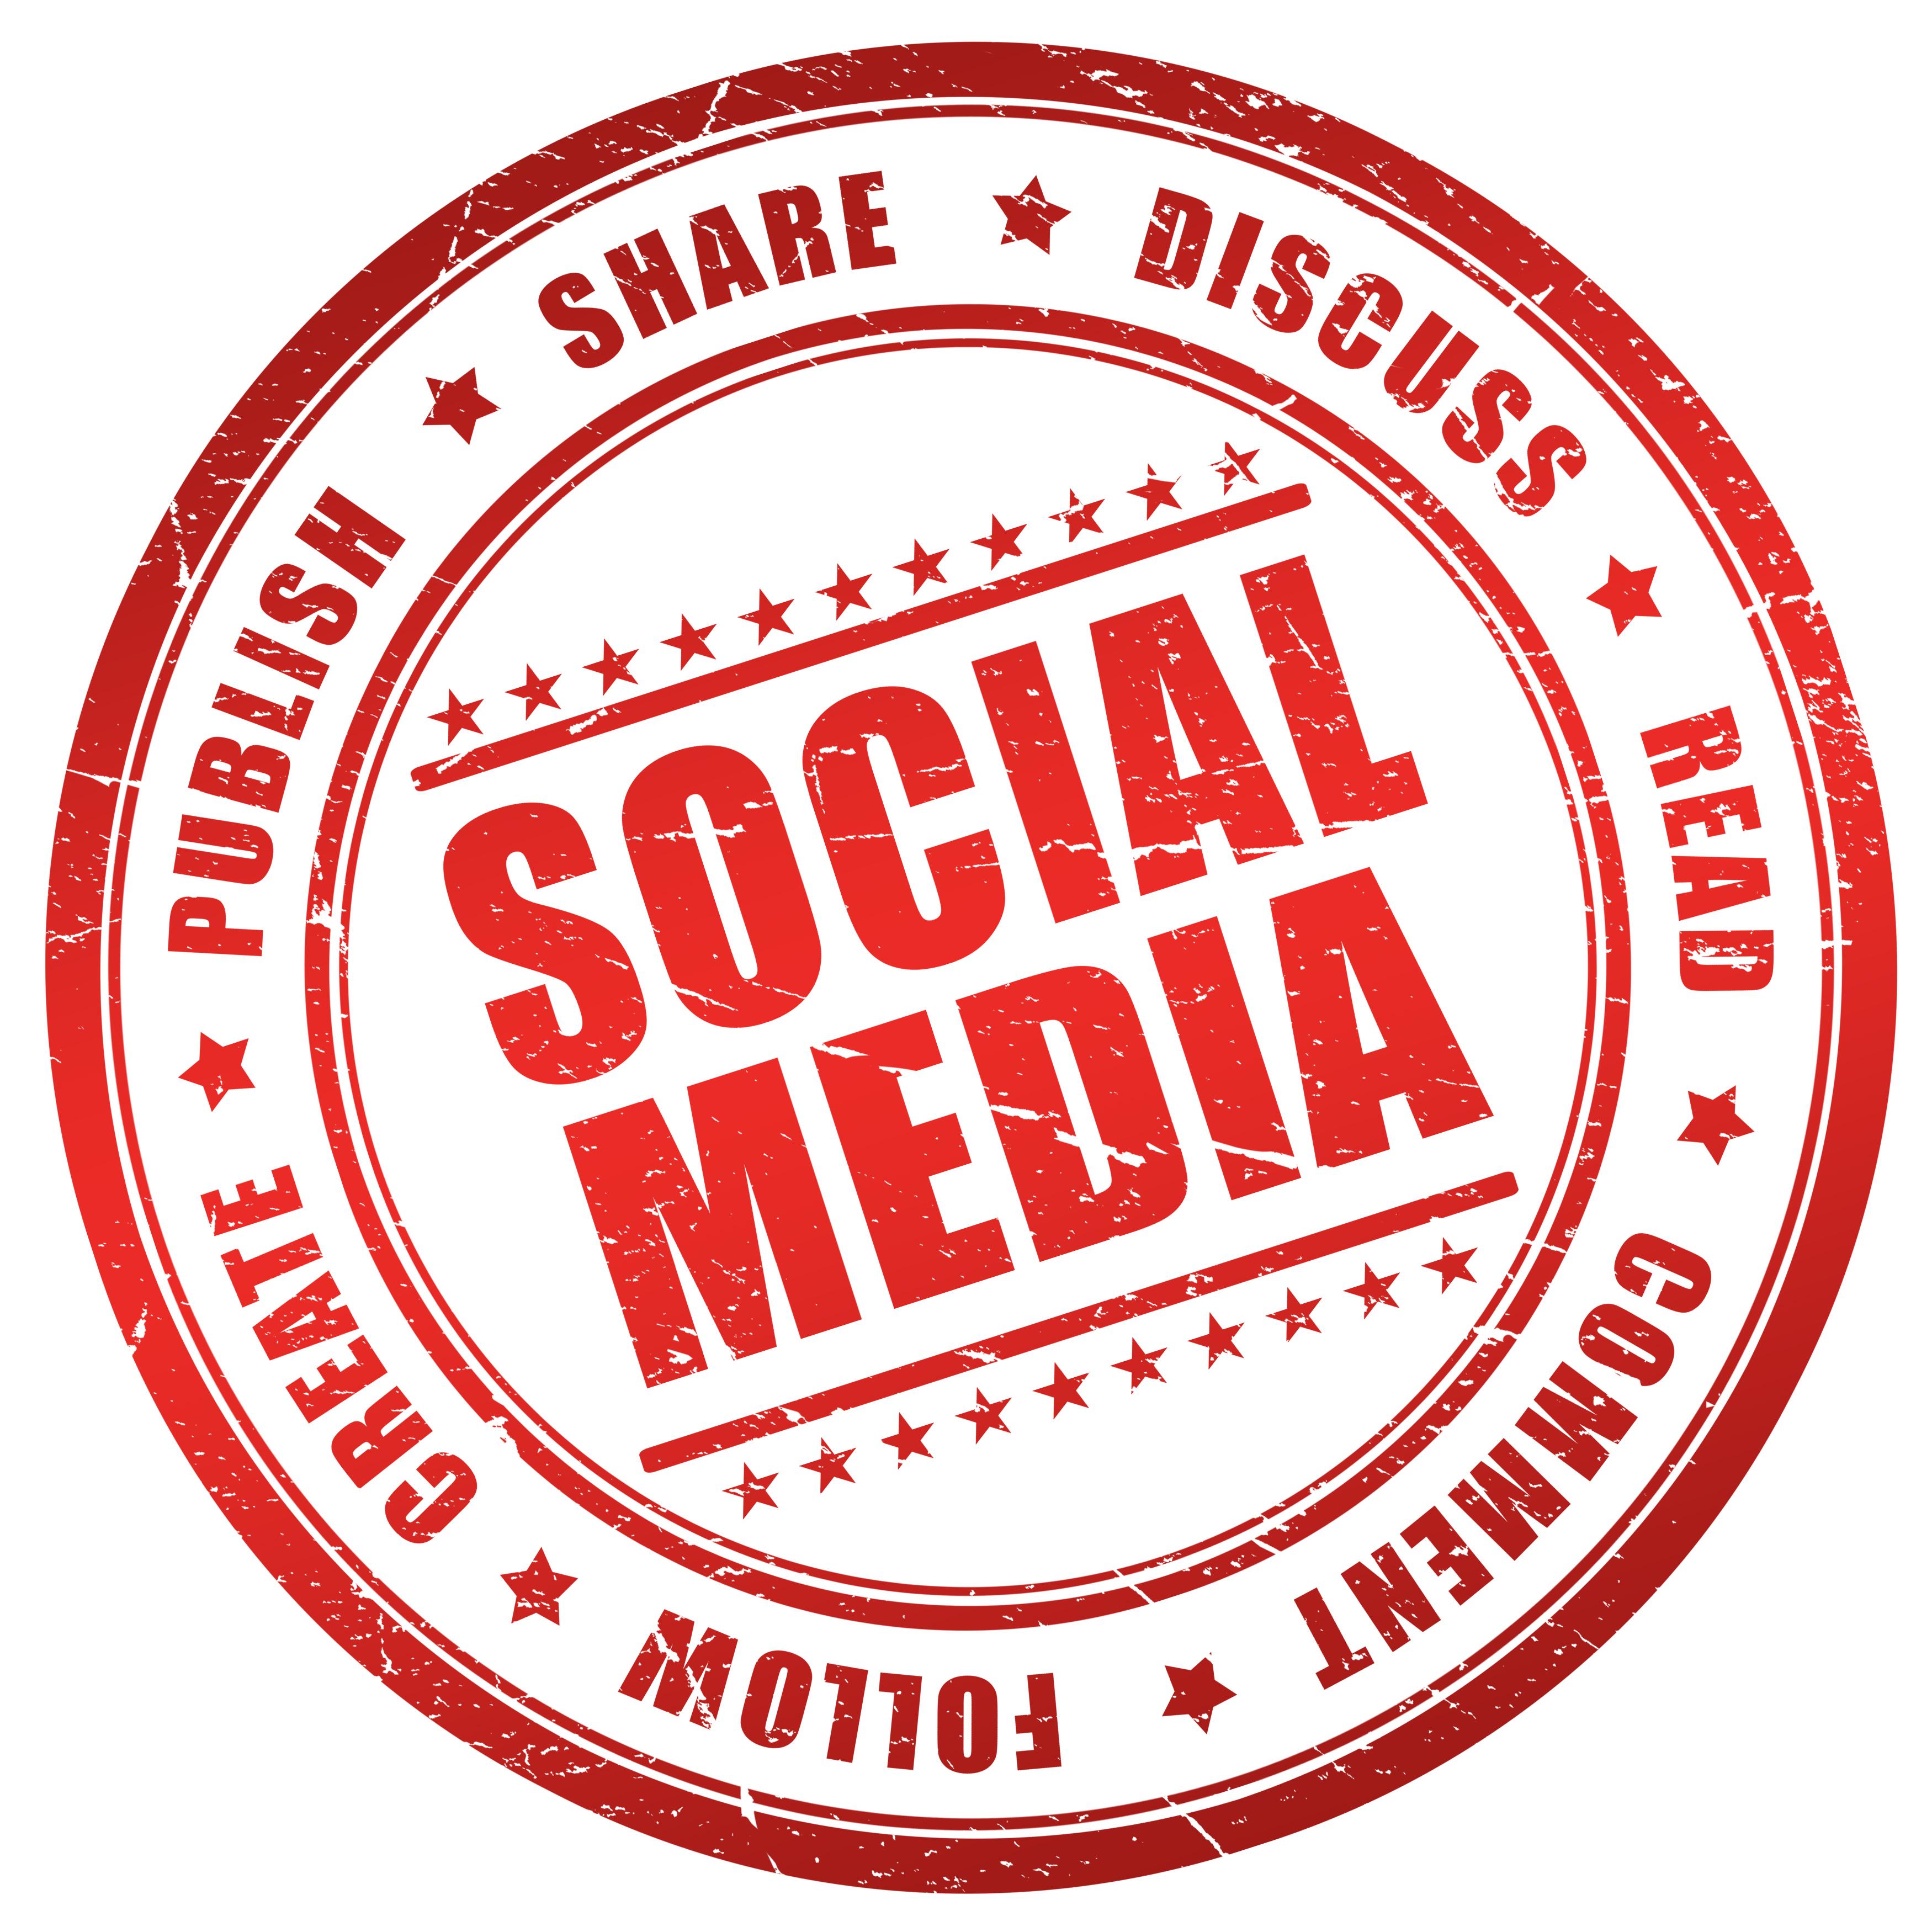 Get Active on Social Media